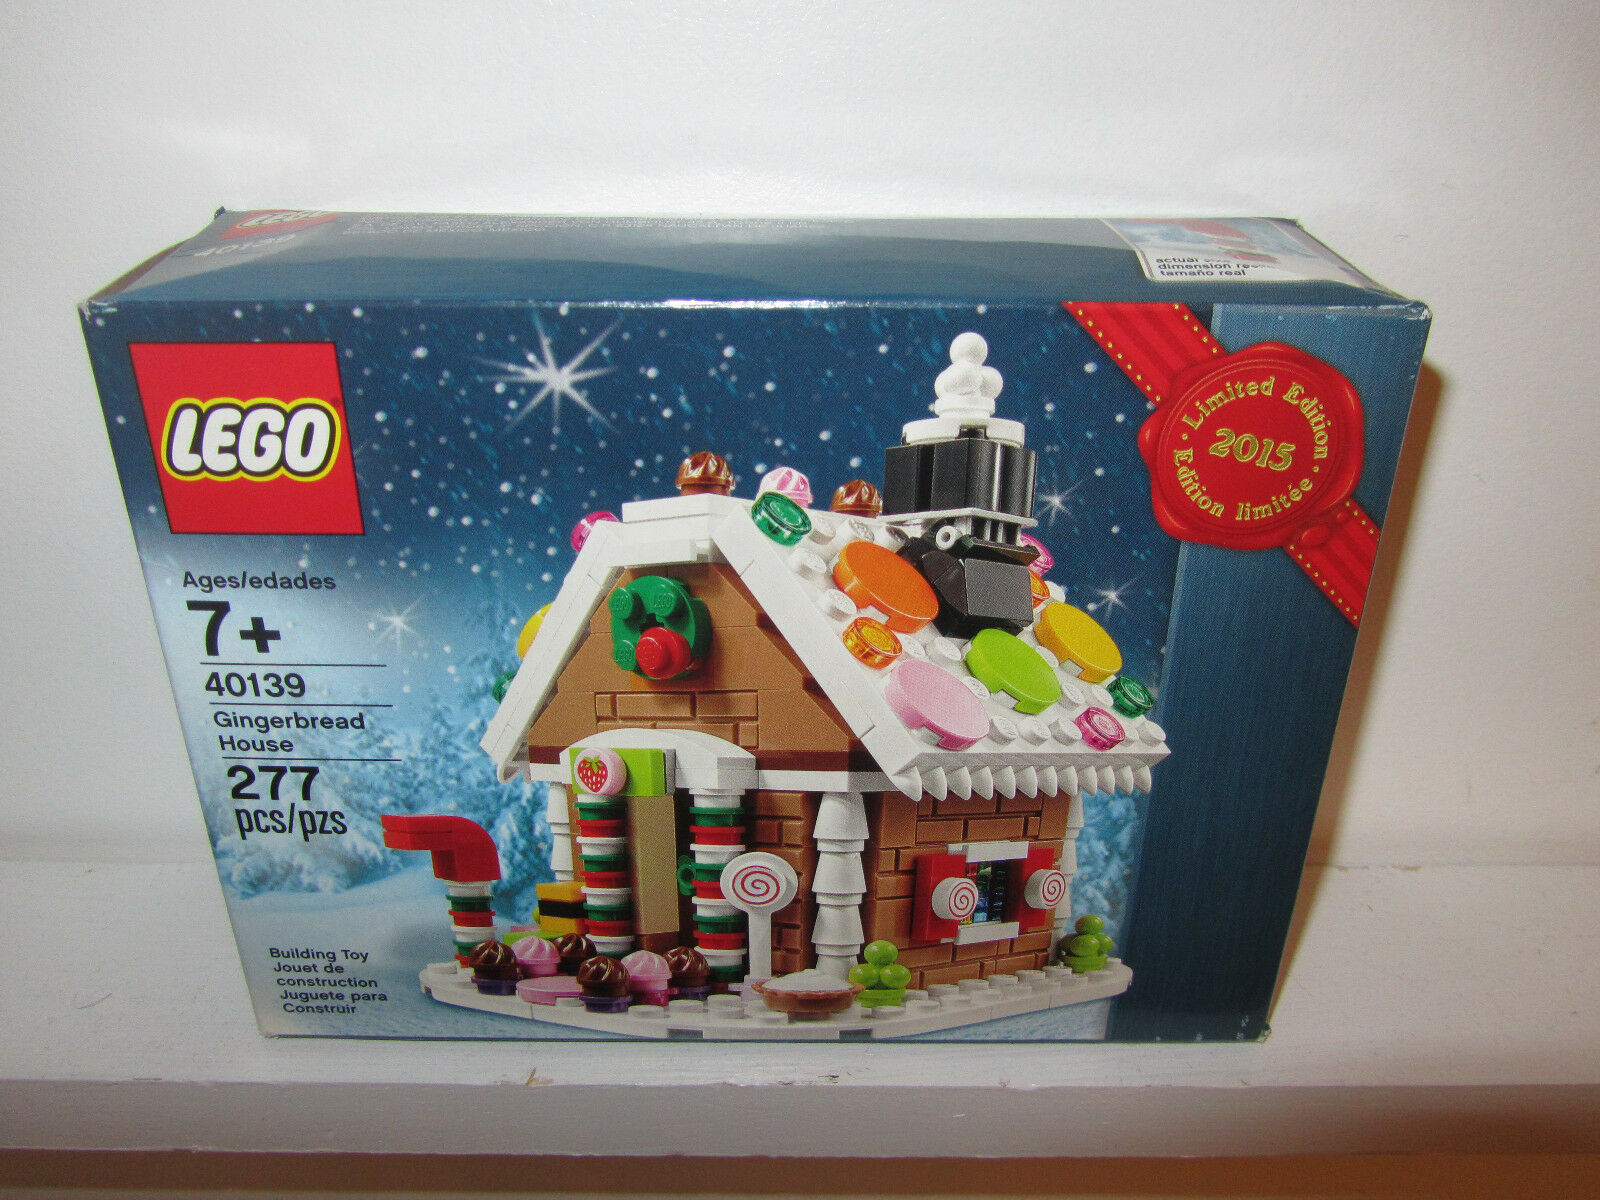 Lego Lego Lego Santa Gingerbread House Lot Set NEW SEALED BOX Christmas Promo Limited Edt c7cecd